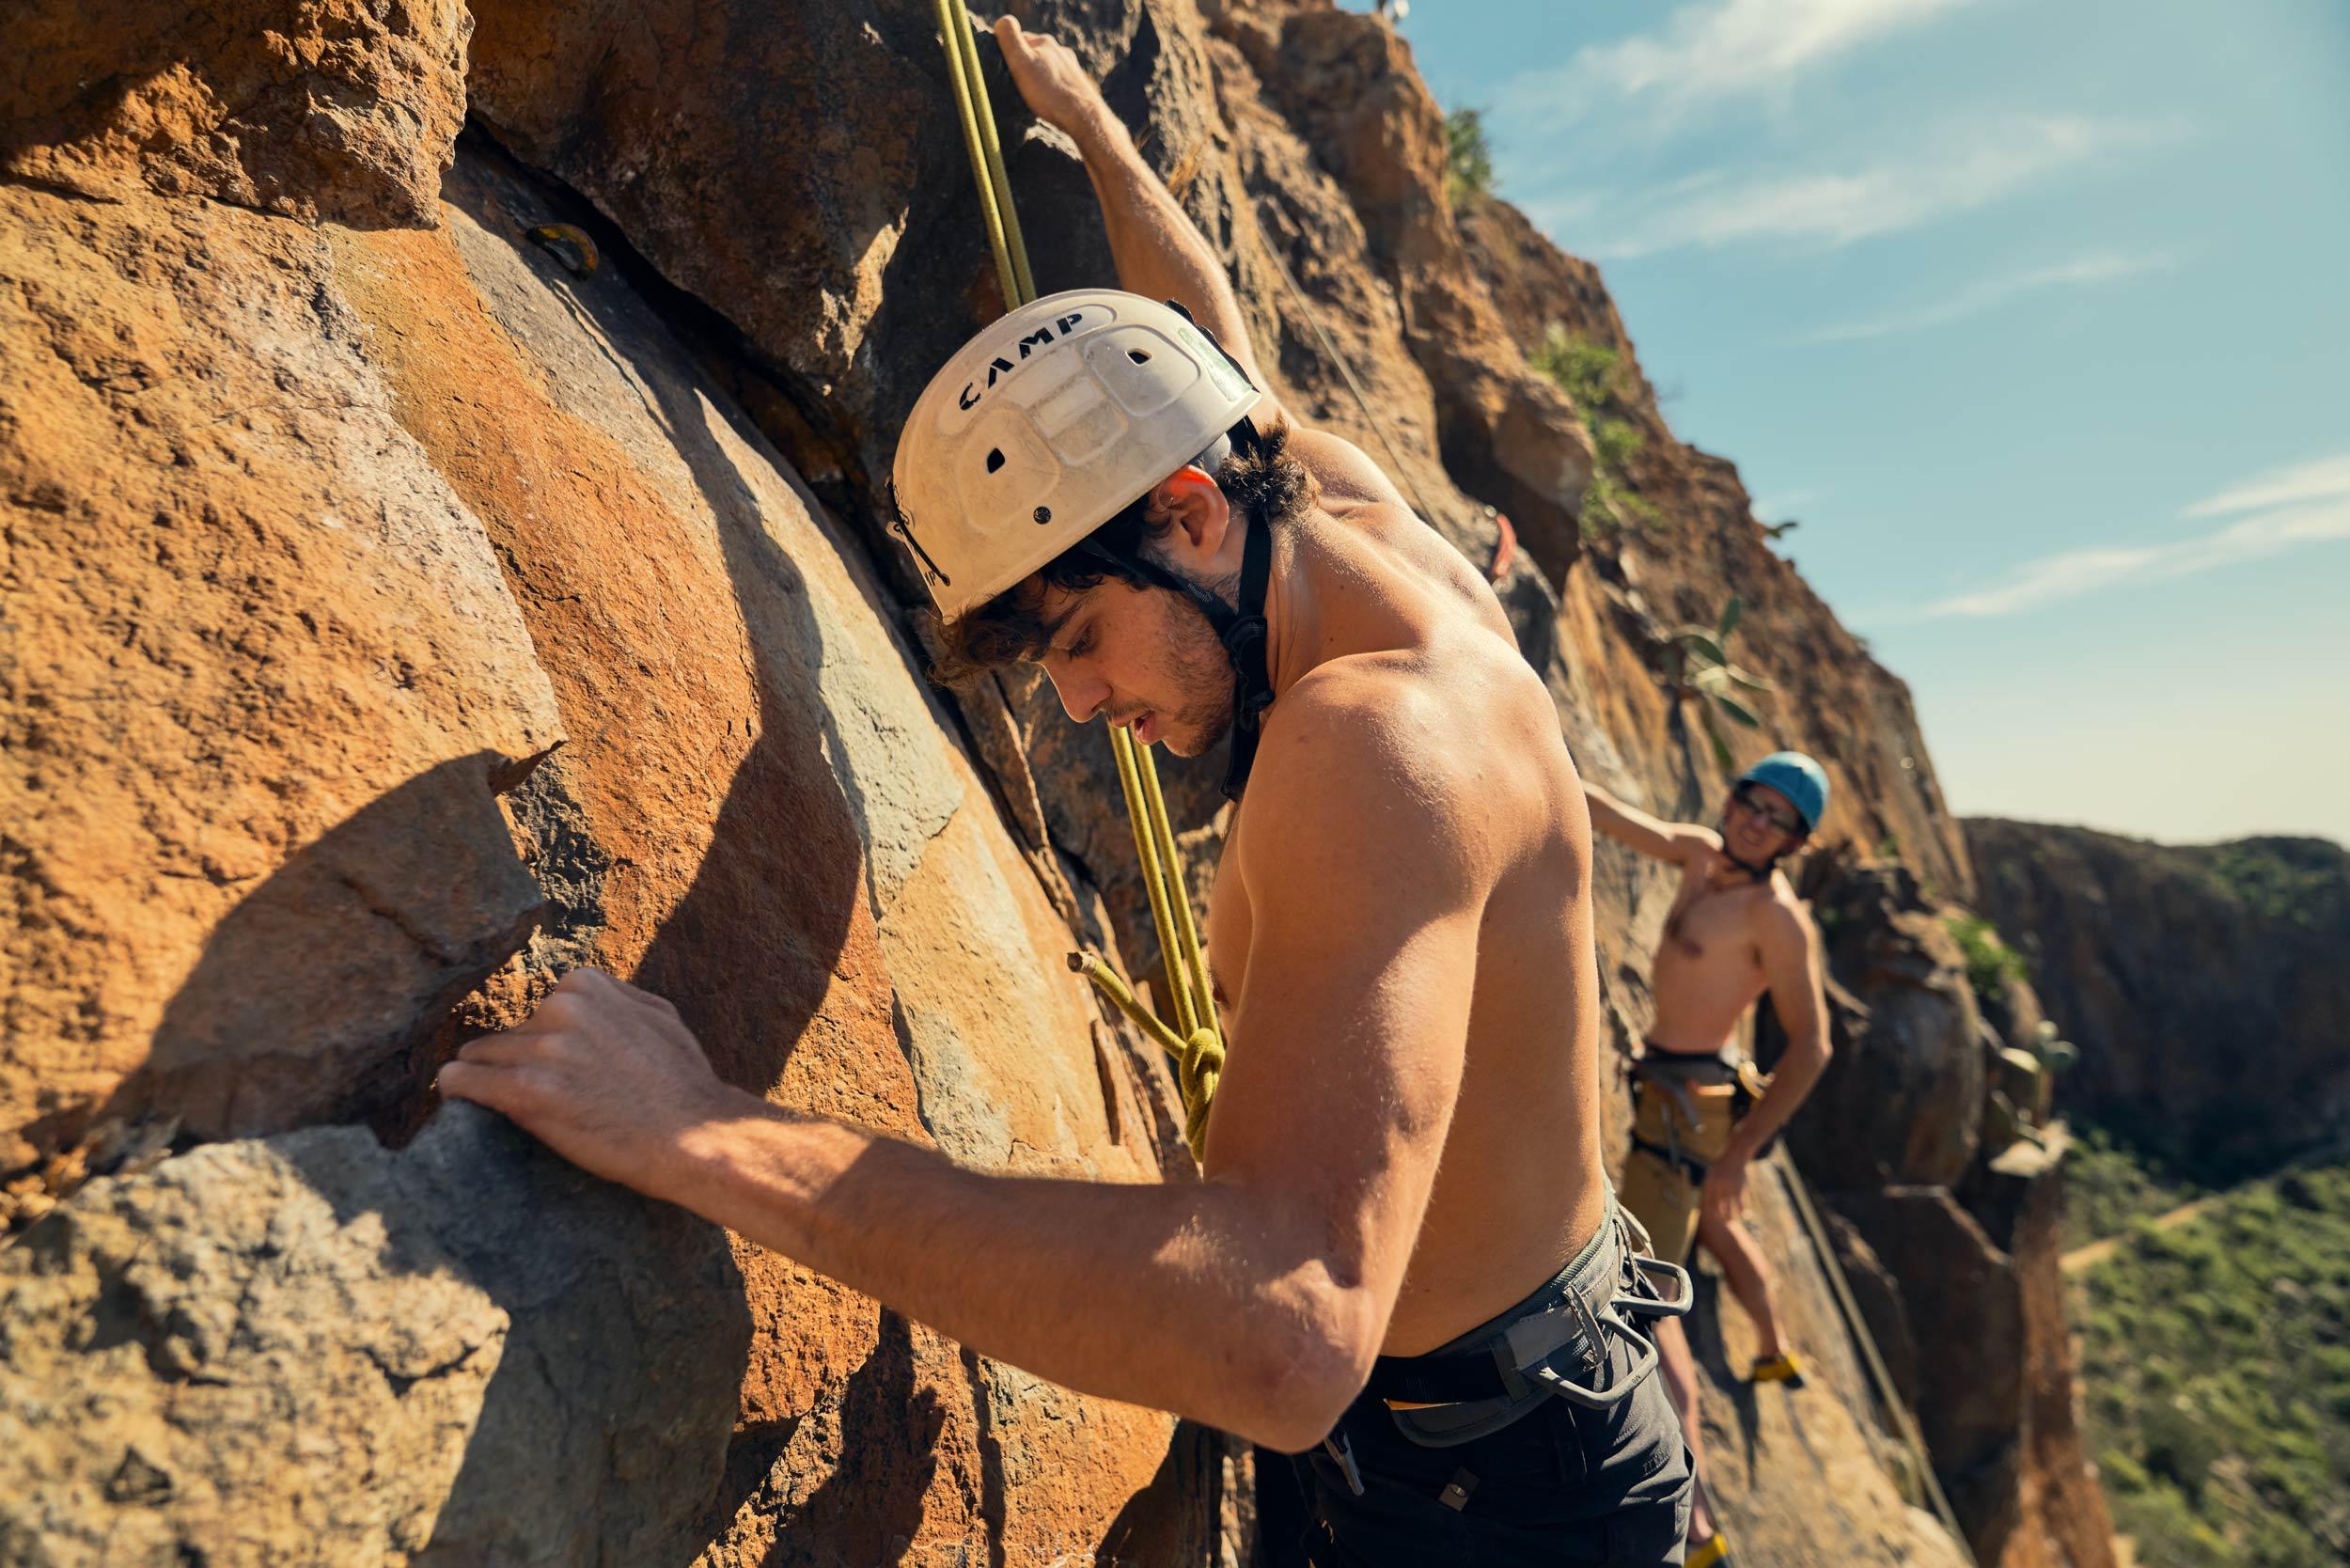 121918_maguire_eb_tenerife_climbing_5505